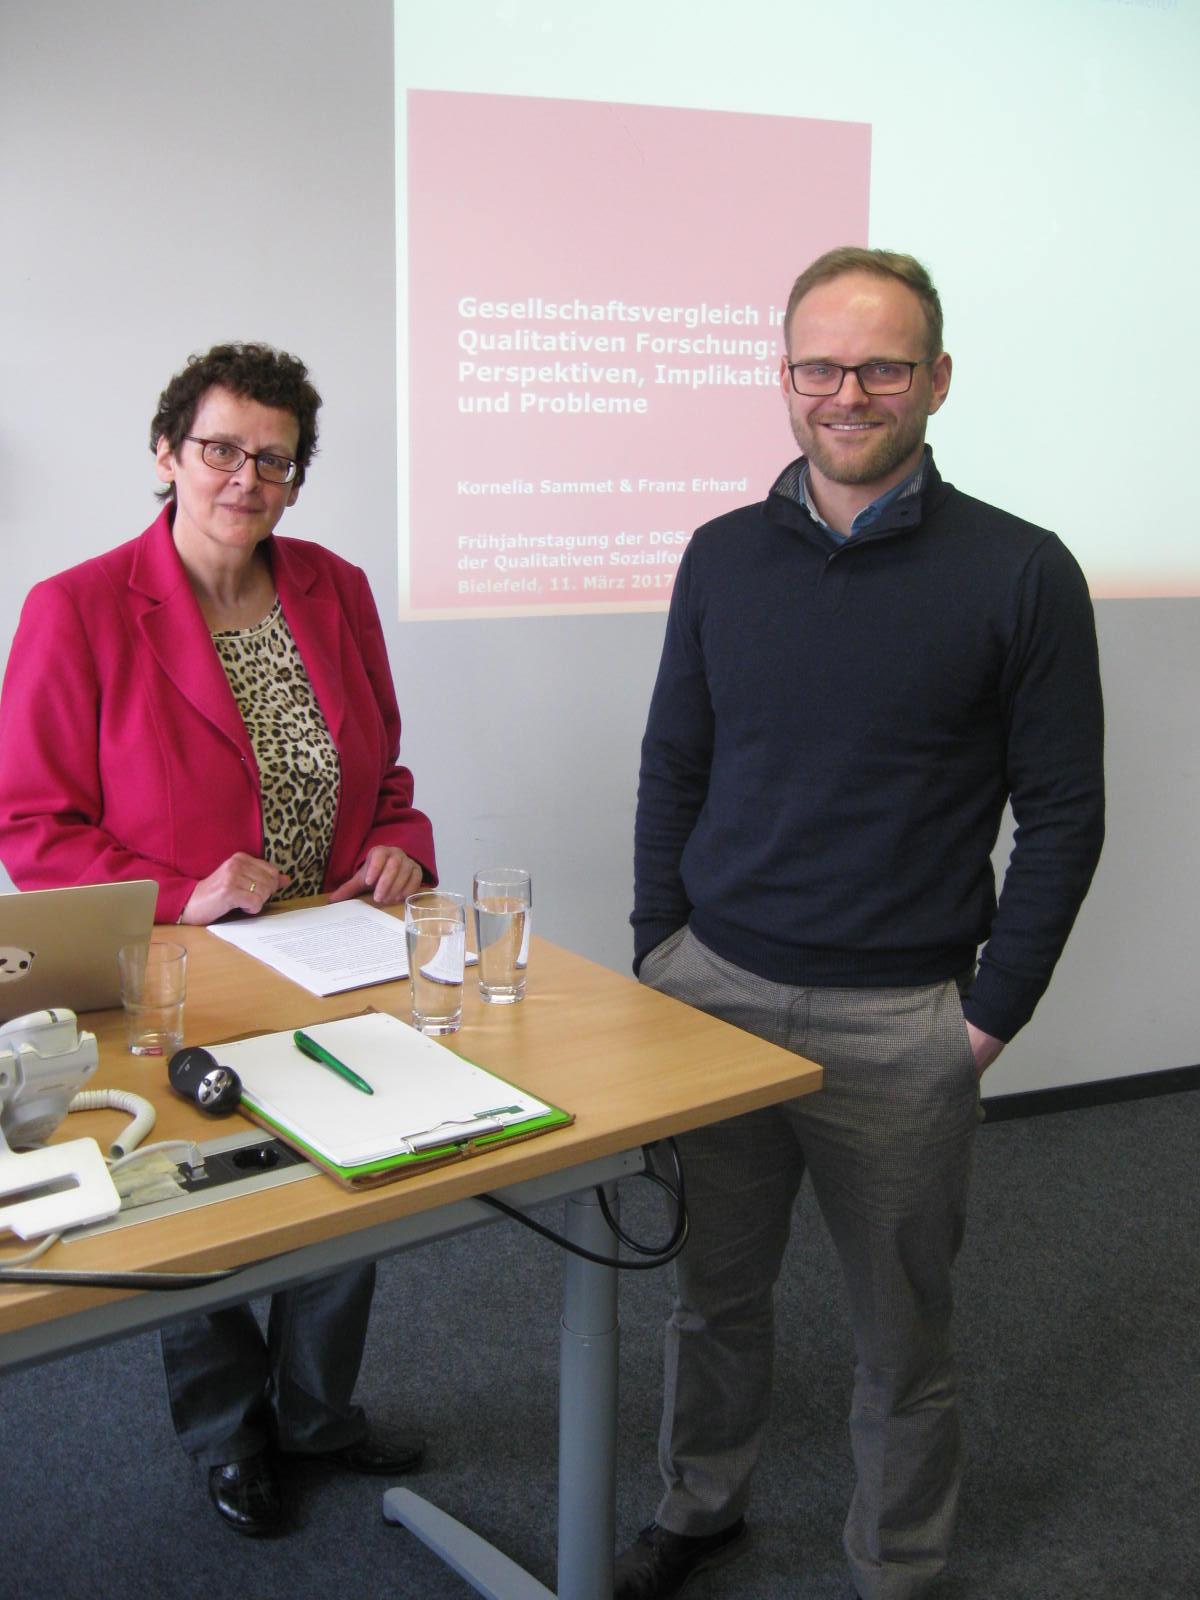 Vortrag Bielefeld SekQuali 2017